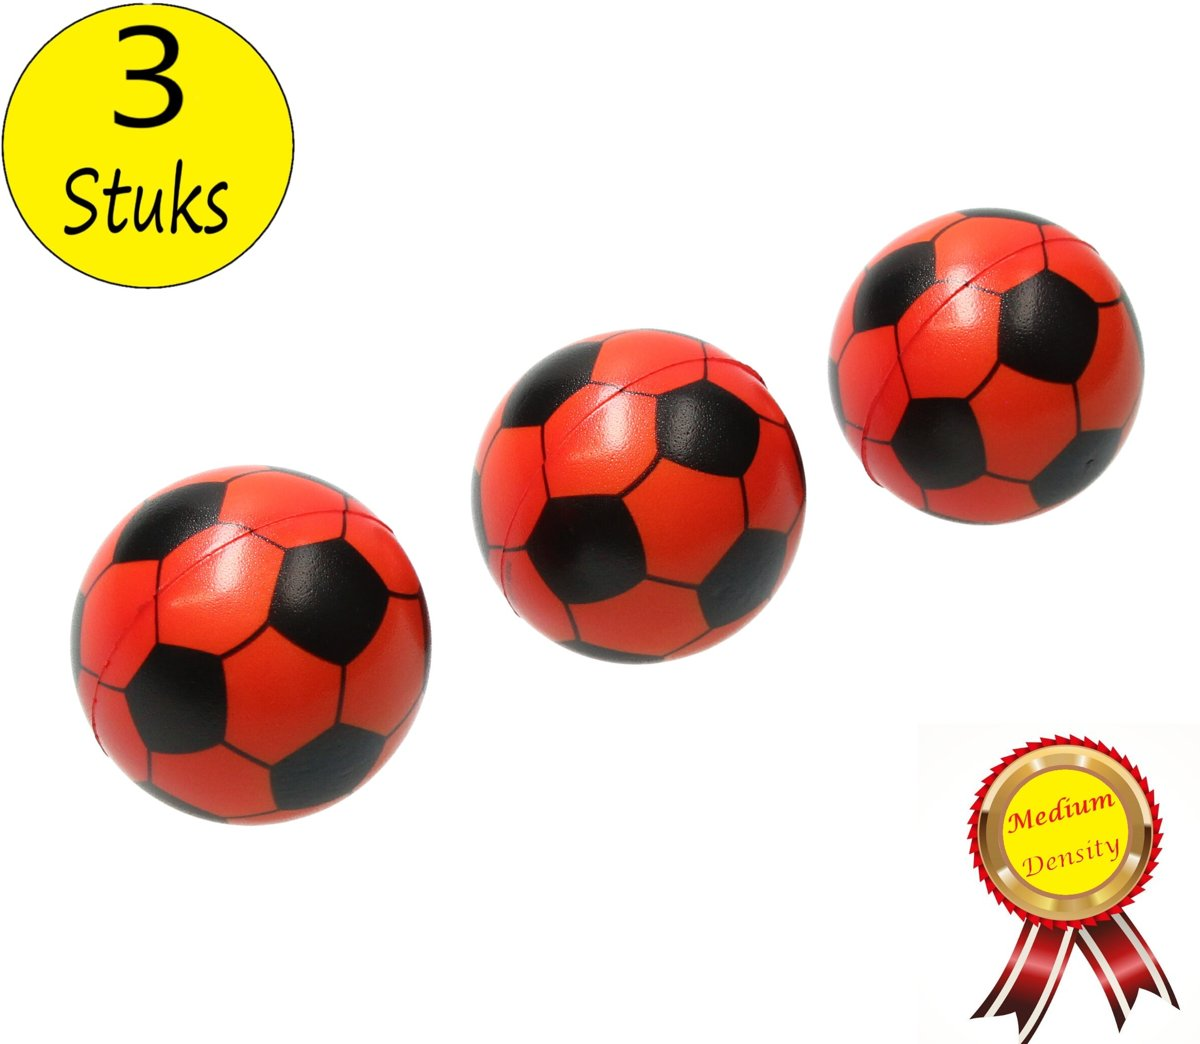 Stressbal Medium Density Voetbal 3 Stuks – Sensomotorische Stimulatie – Anti Stress – Oranje